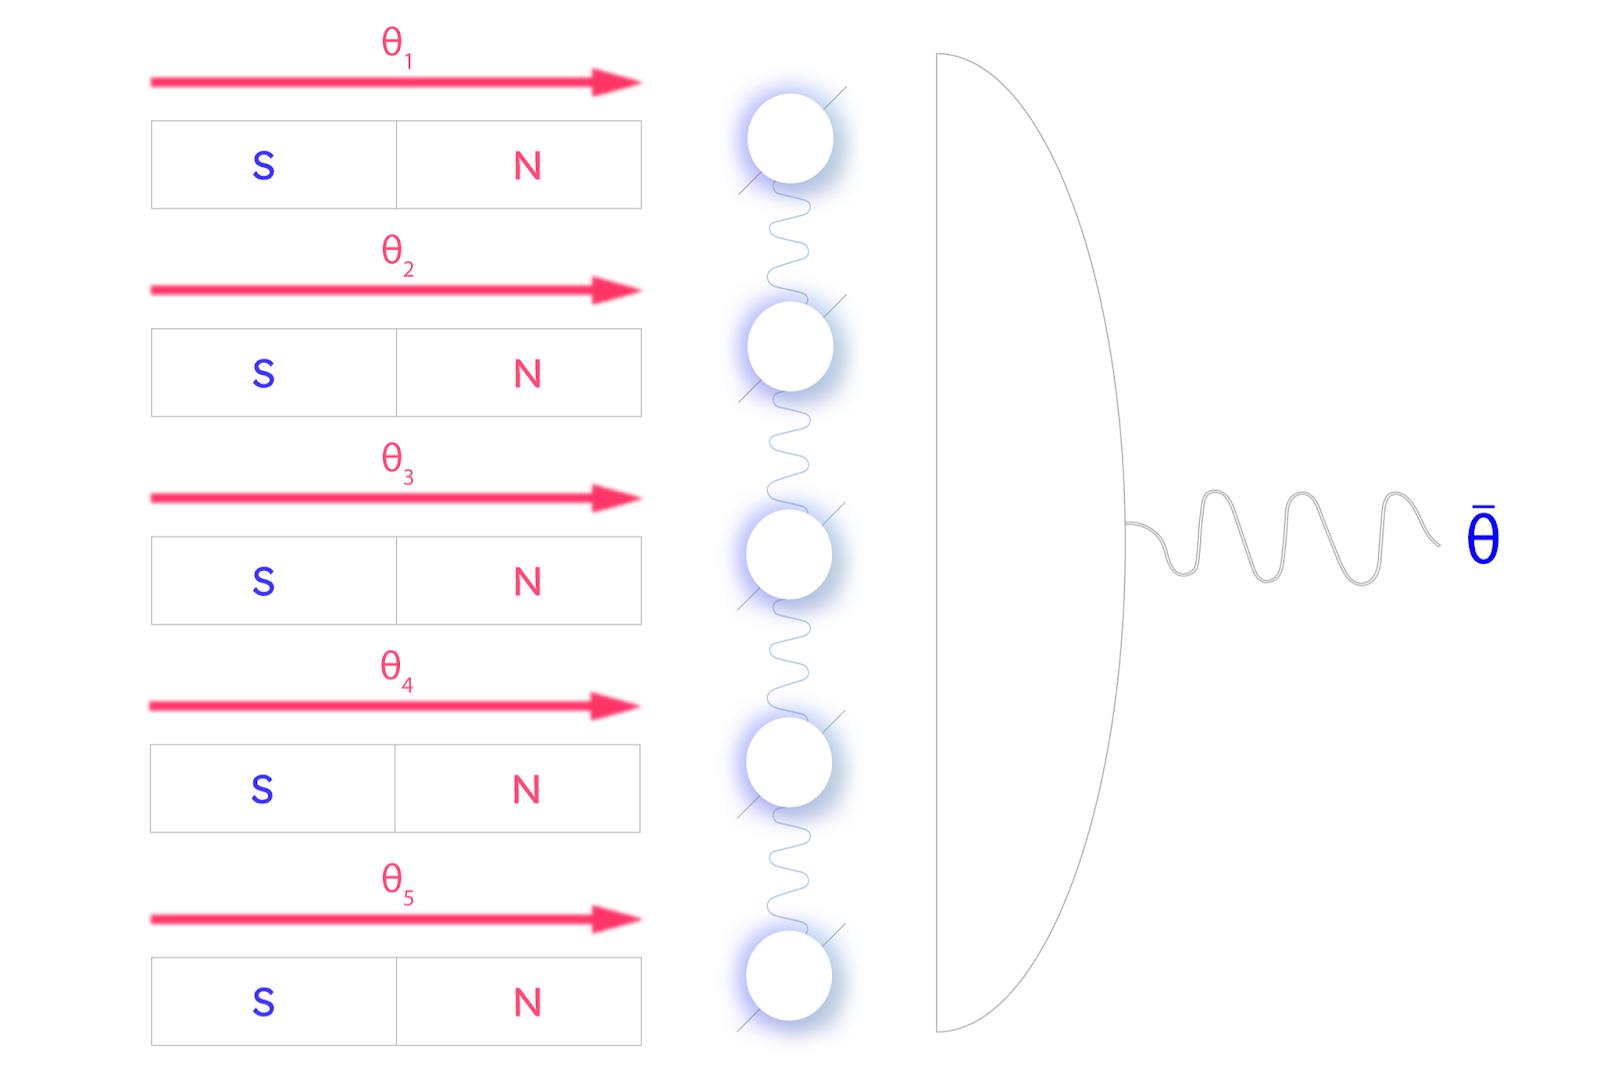 A network of entangled sensors estimates the average θ̄ of a set of parameters θ1 through θ5